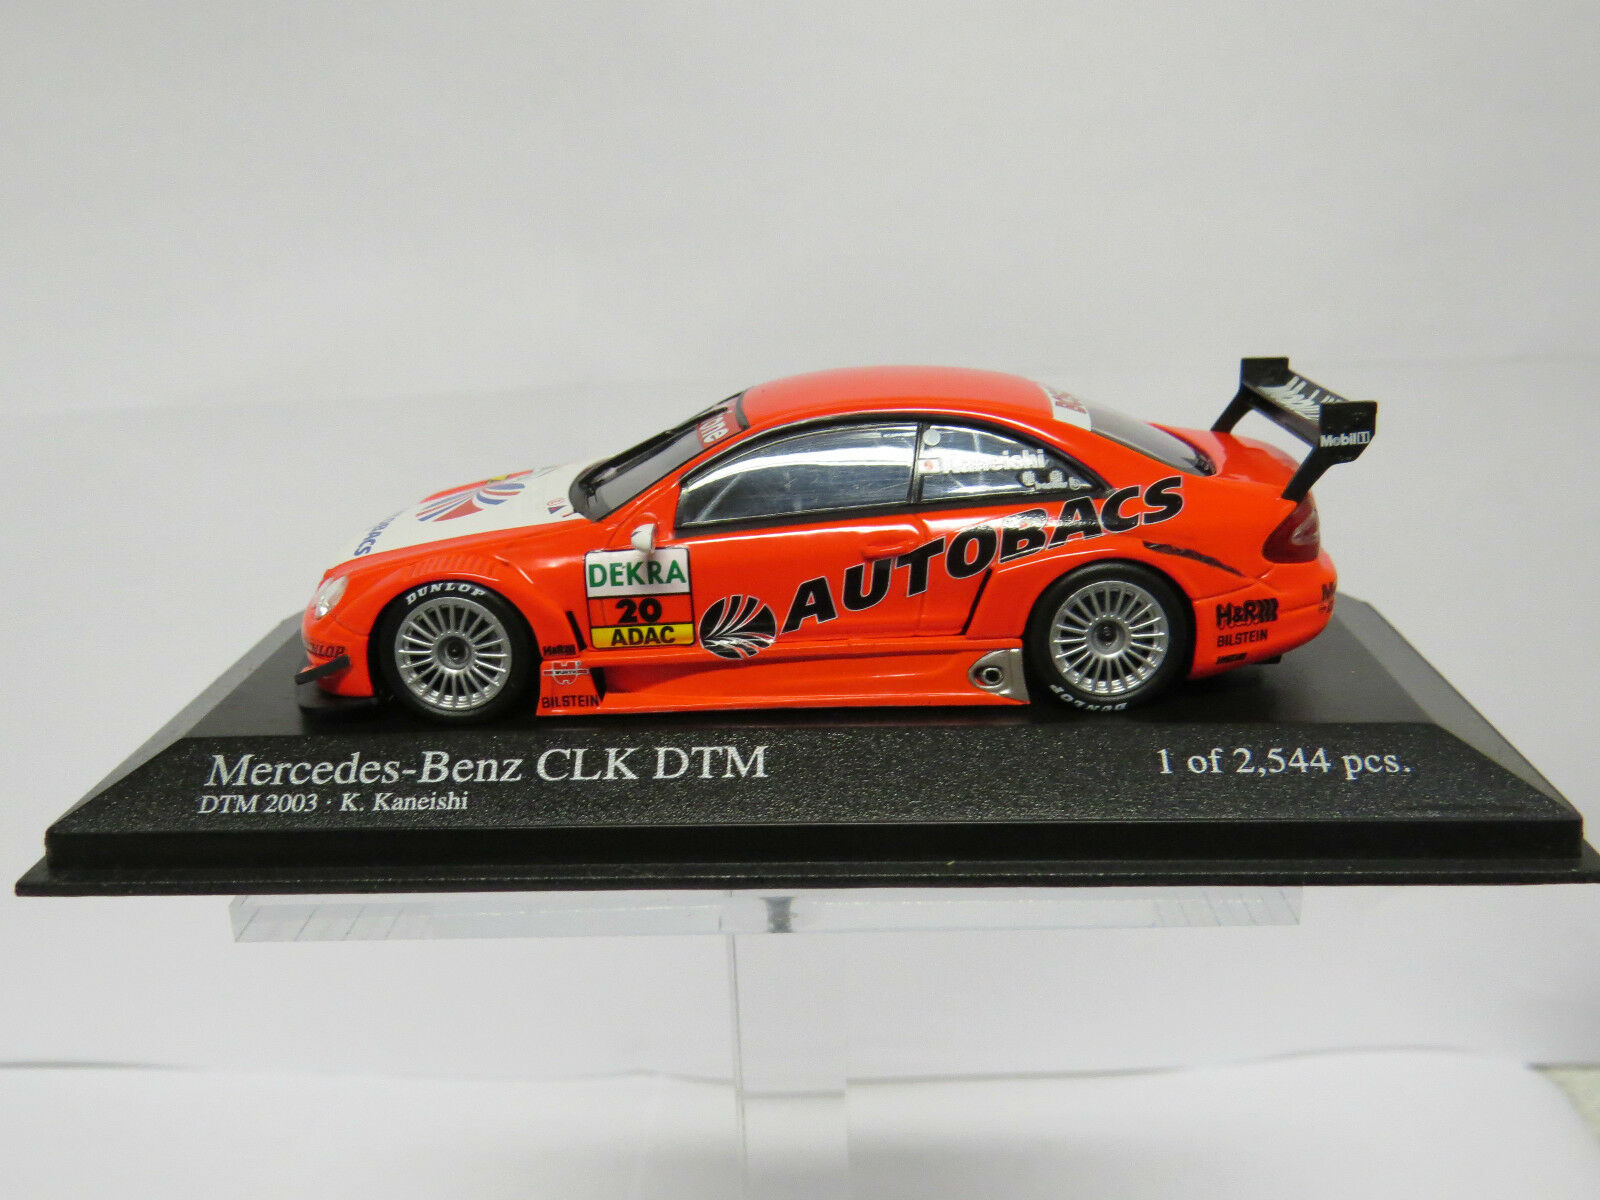 Mercedes-Benz CLK DTM 2003 K. K. K. Kaneishi 1 43 'Arta' Team Persson  Nr. 400033220 6a7b36